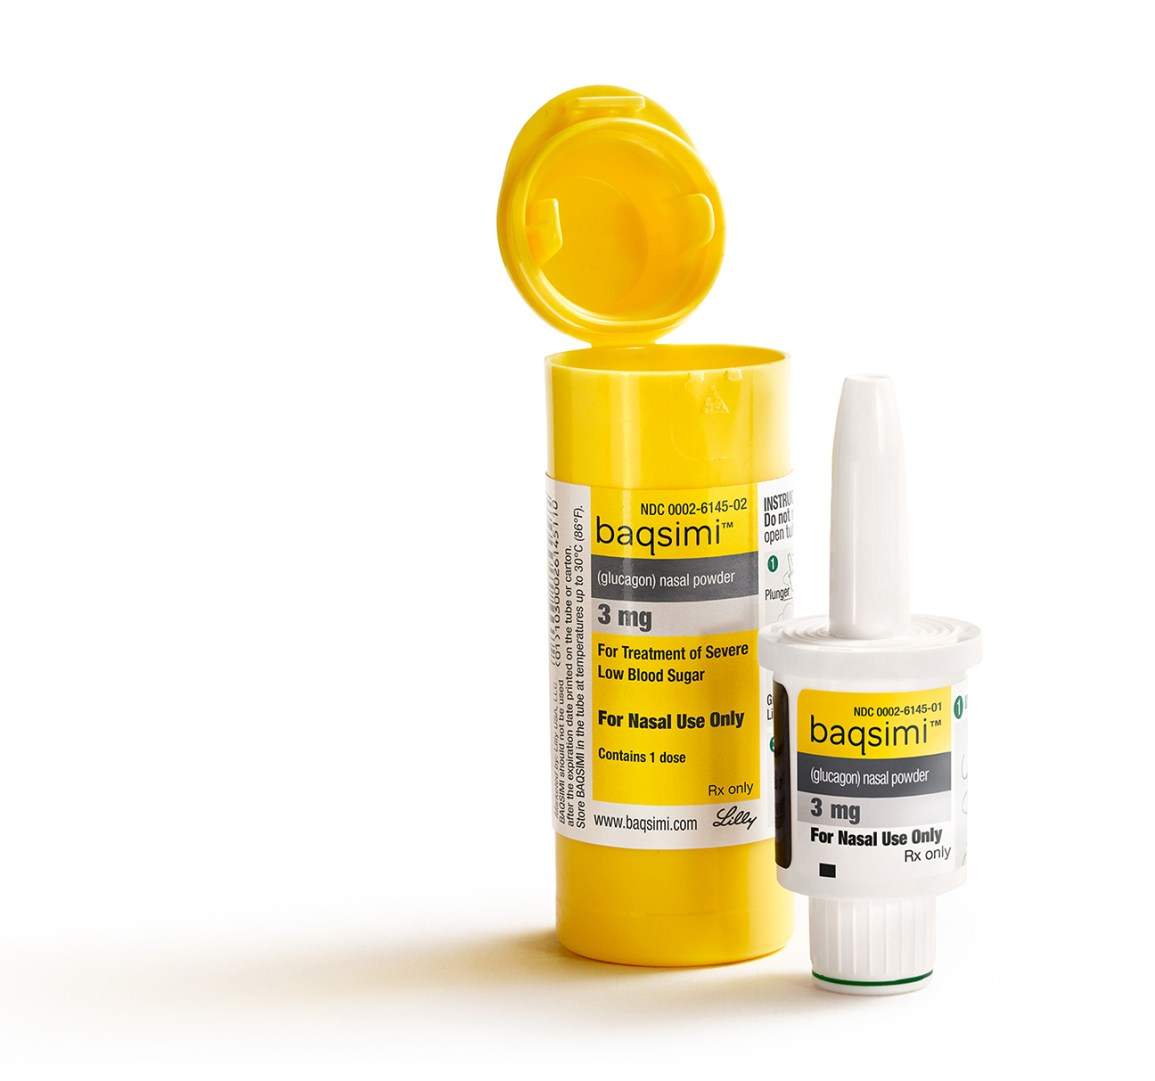 NEWS: FDA OKs First Nasal Glucagon! (Needle-Free Emergency Treatment)